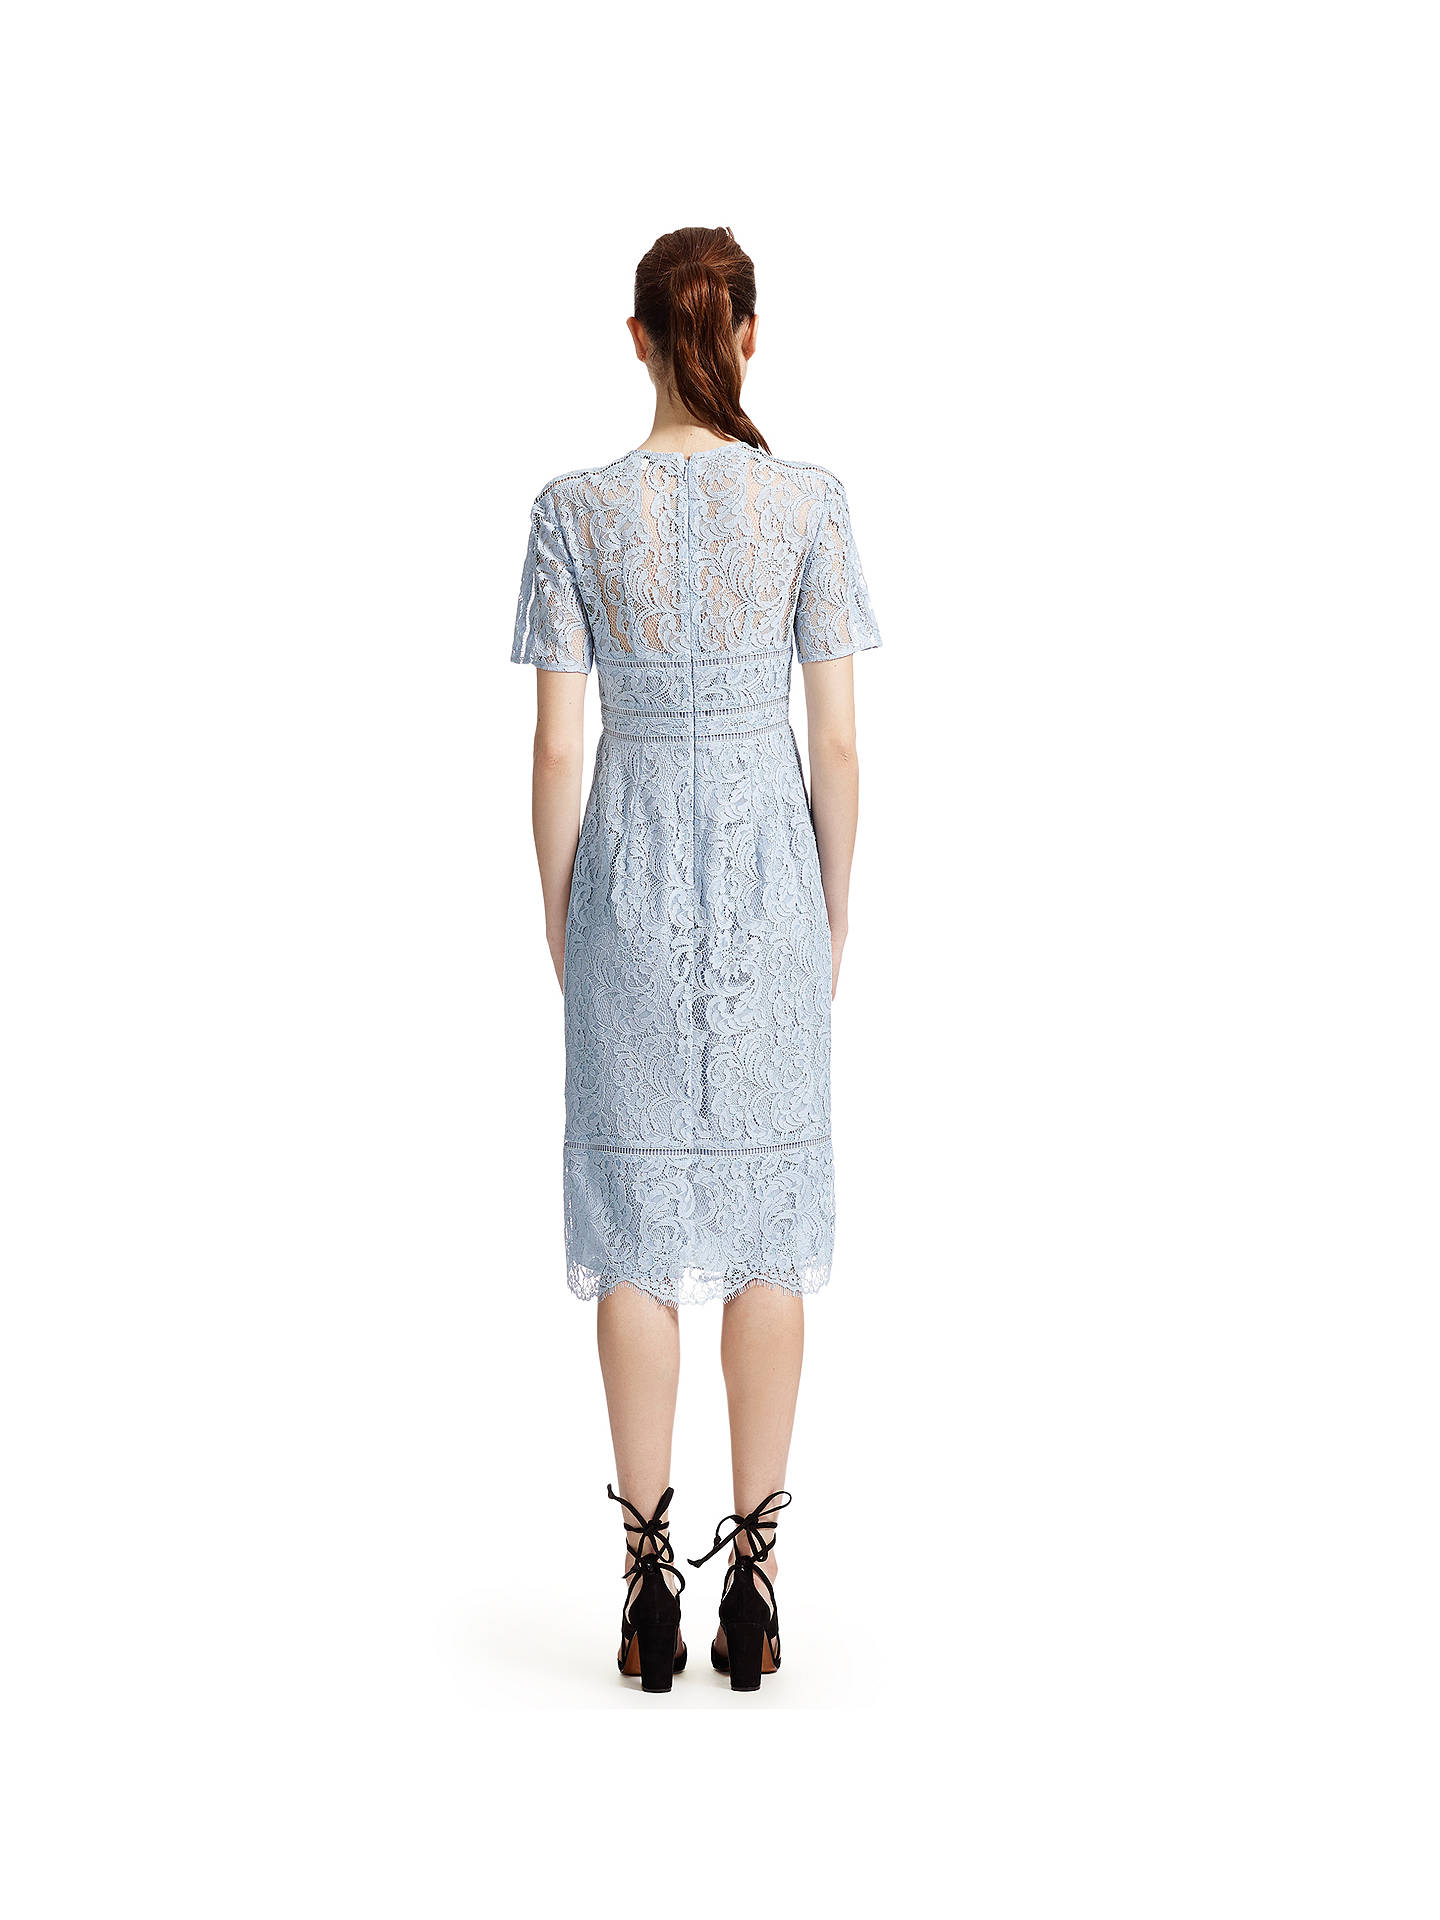 e396fda8645213 ... Buy Whistles Lily Lace Shift Dress, Pale Blue, 6 Online at johnlewis.com